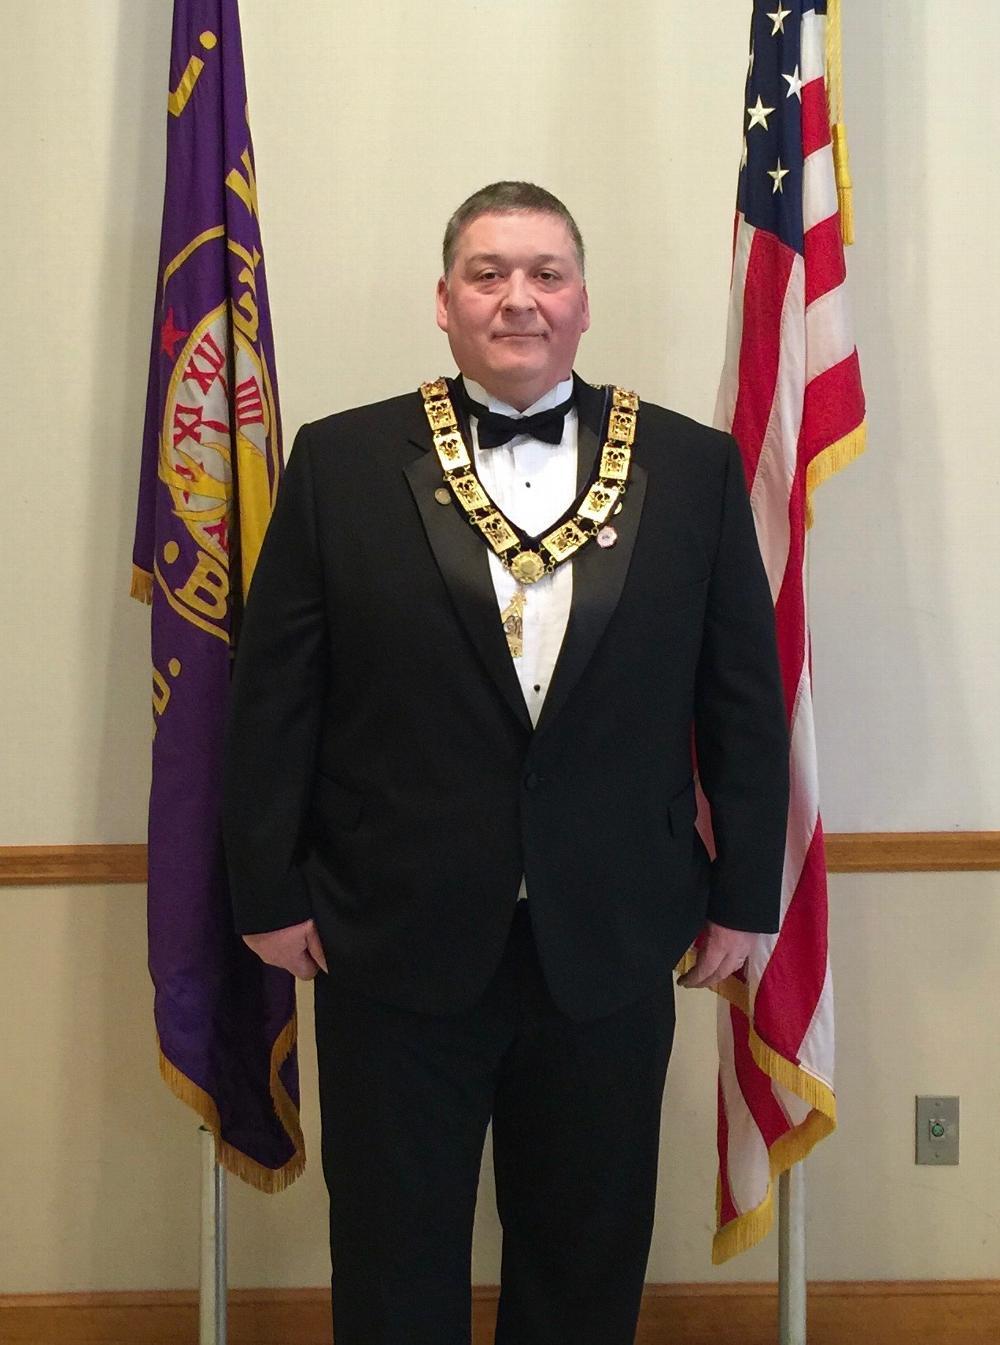 Exalted Ruler Chuck Sears 2016 - 2017